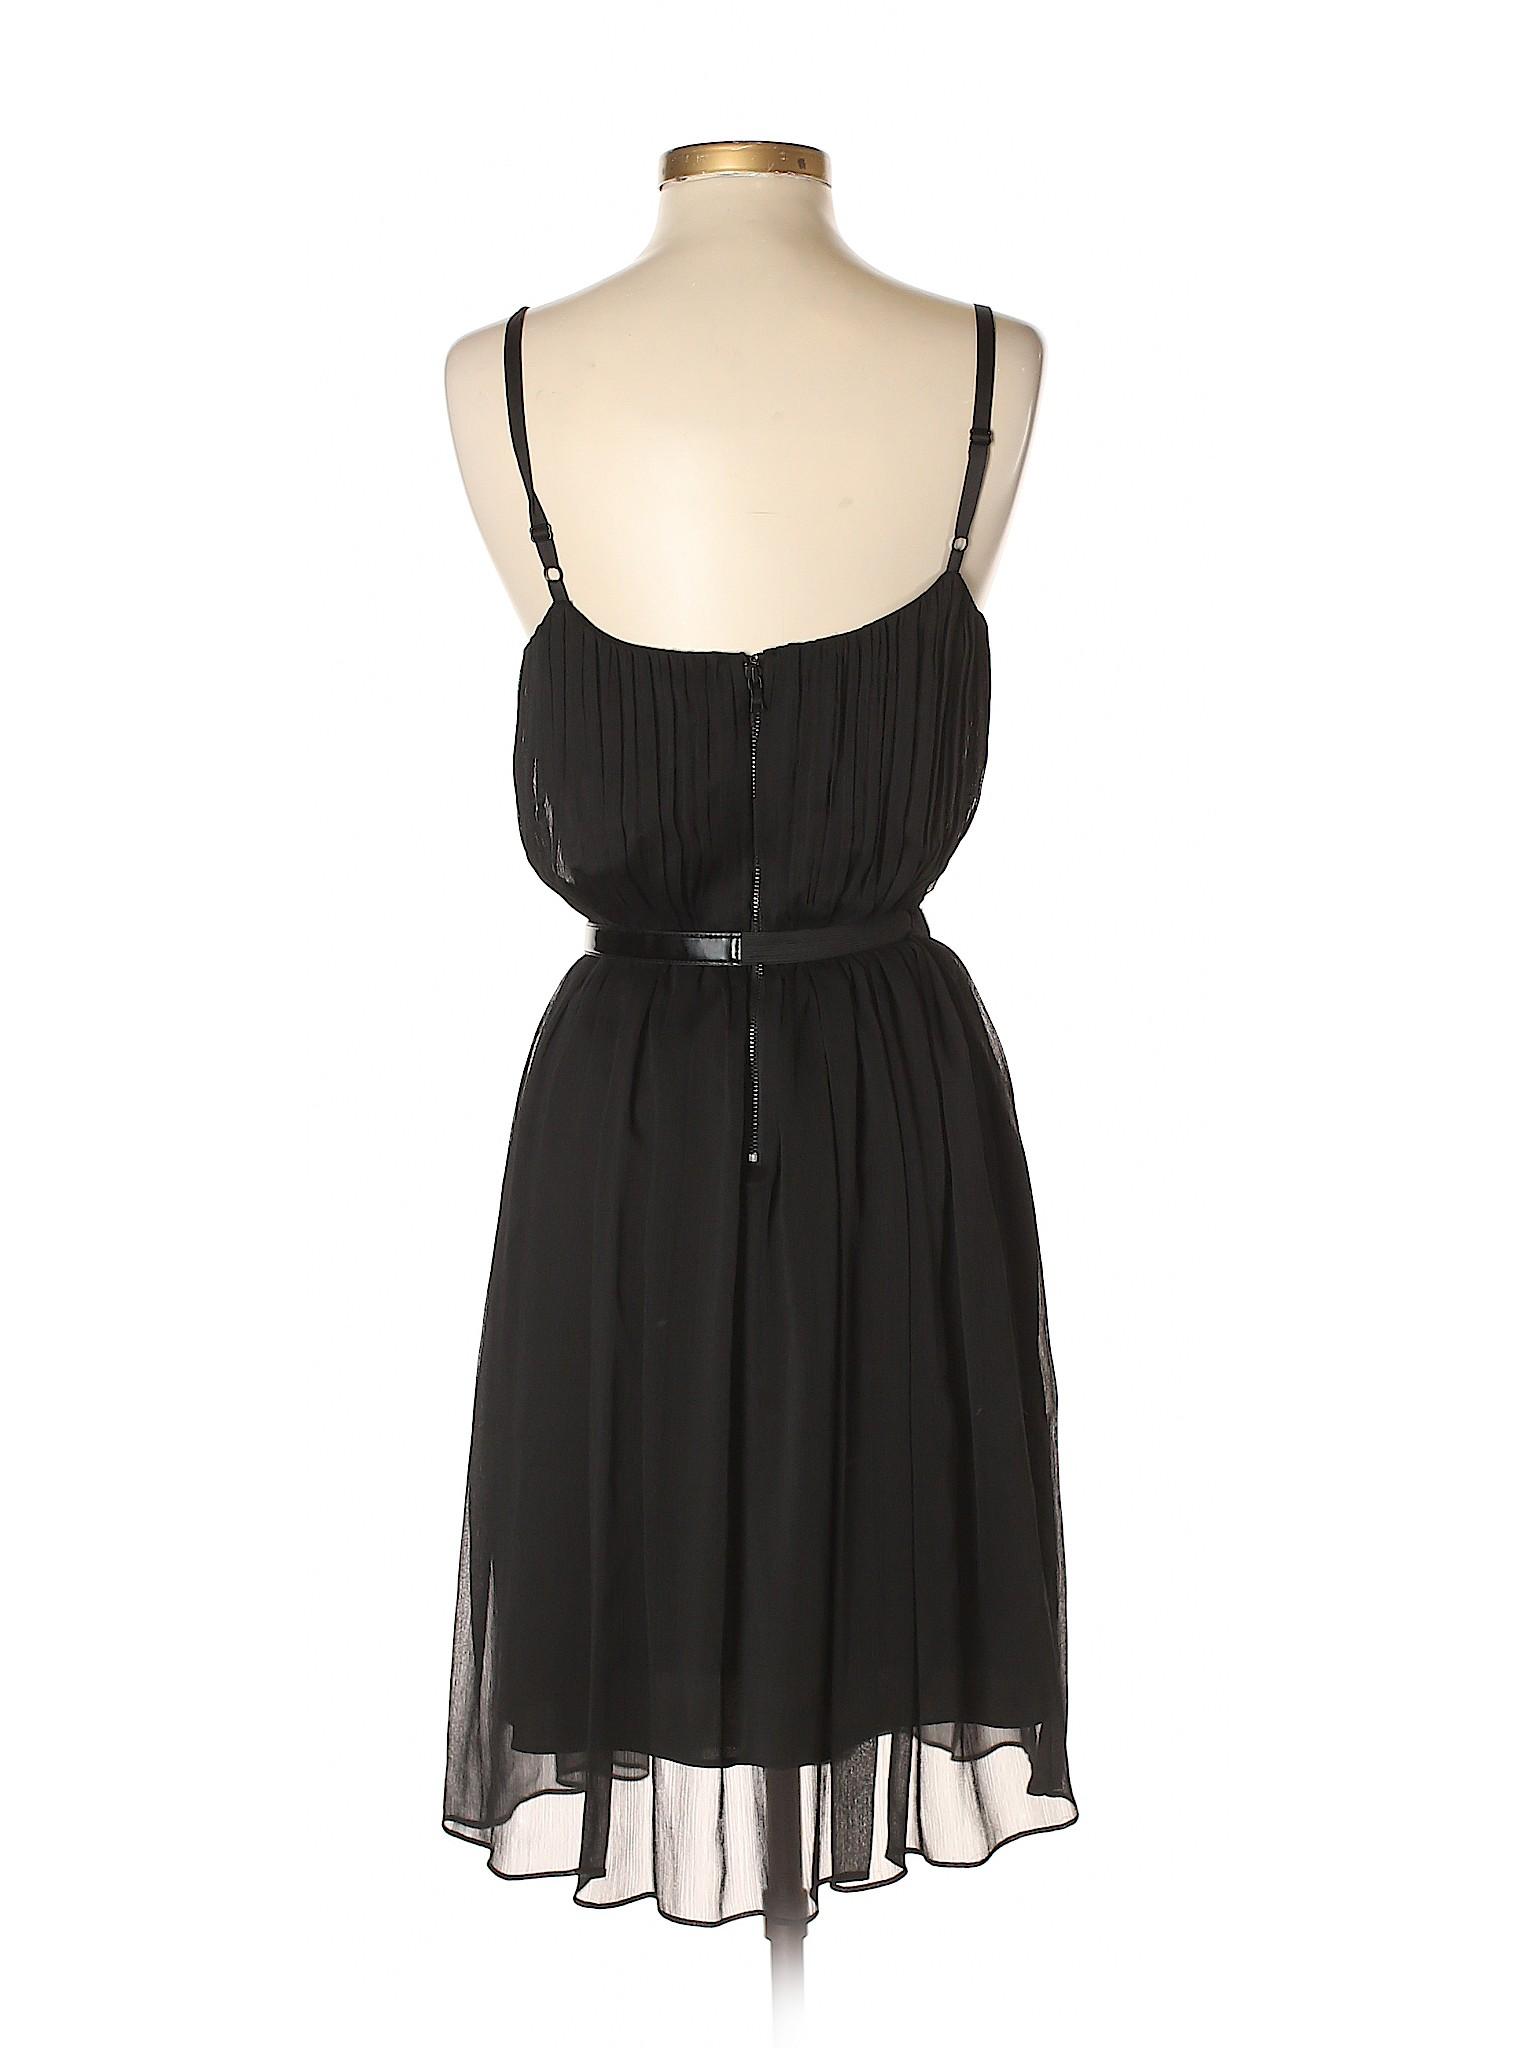 alice olivia Casual Dress winter Boutique UW5qHBT